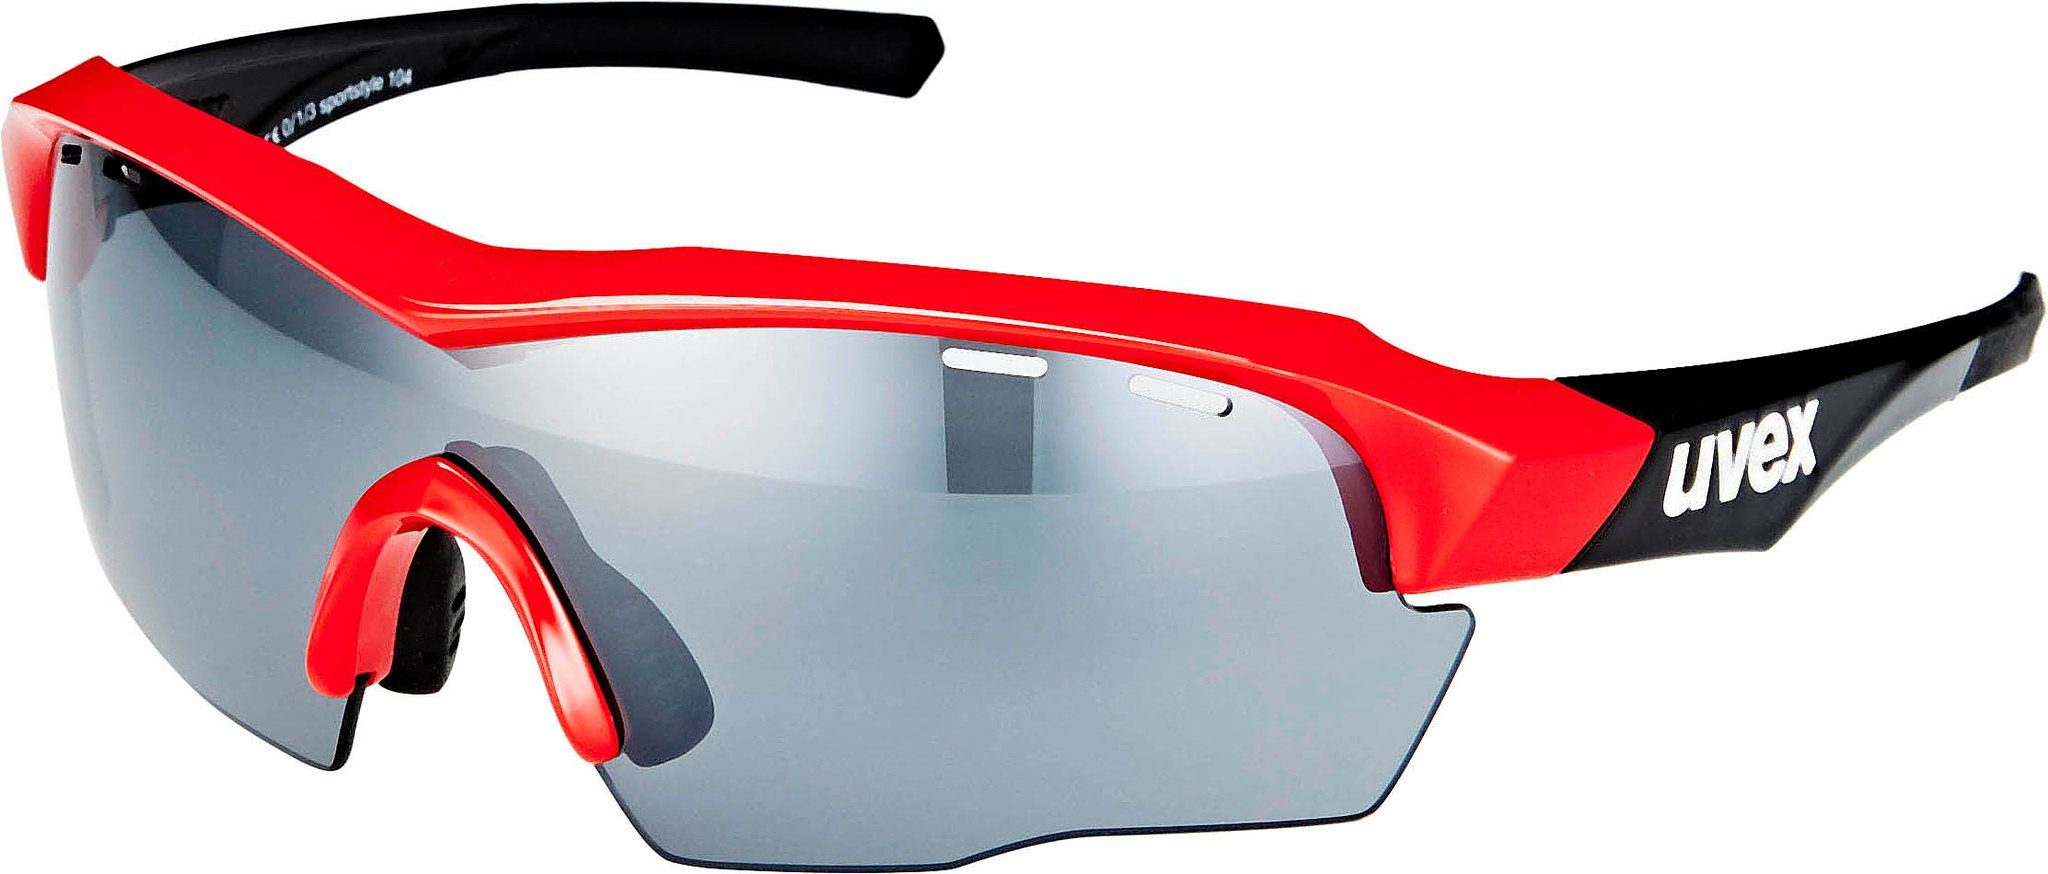 Uvex Radsportbrille »sportstyle 104 Glasses«